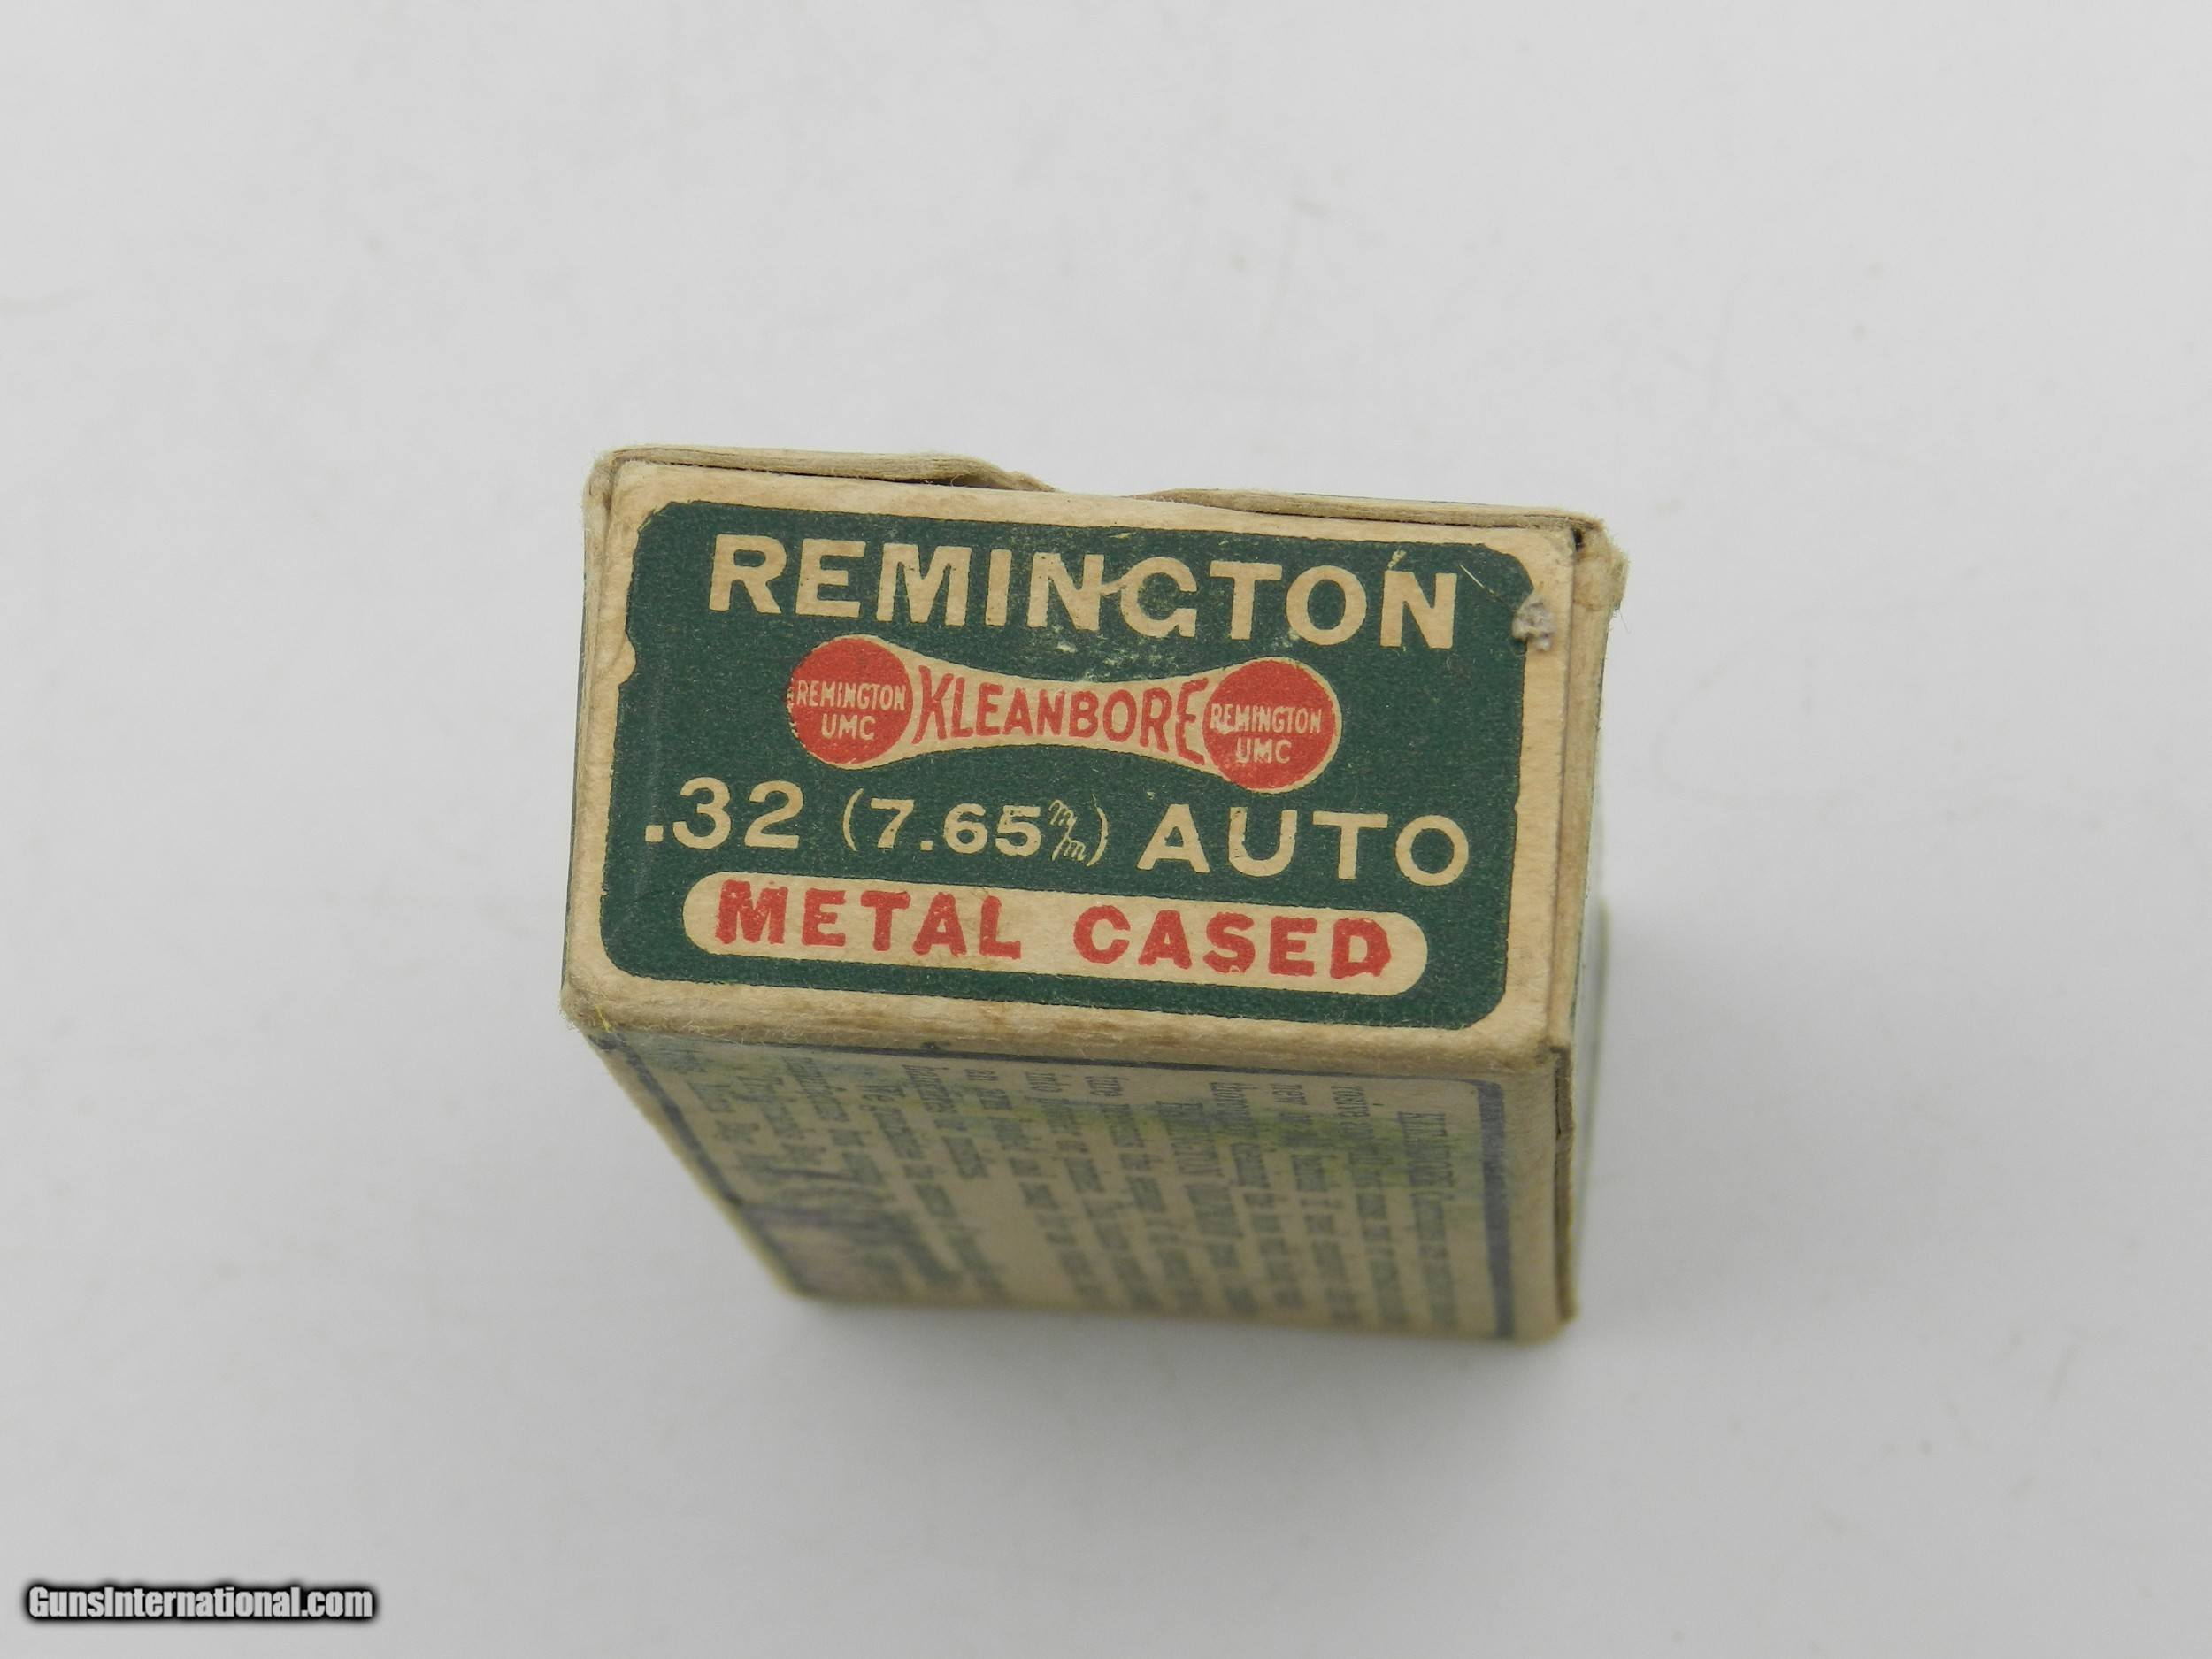 Collectible Ammo: Remington Kleanbore  32 Auto (7 65 mm), 71